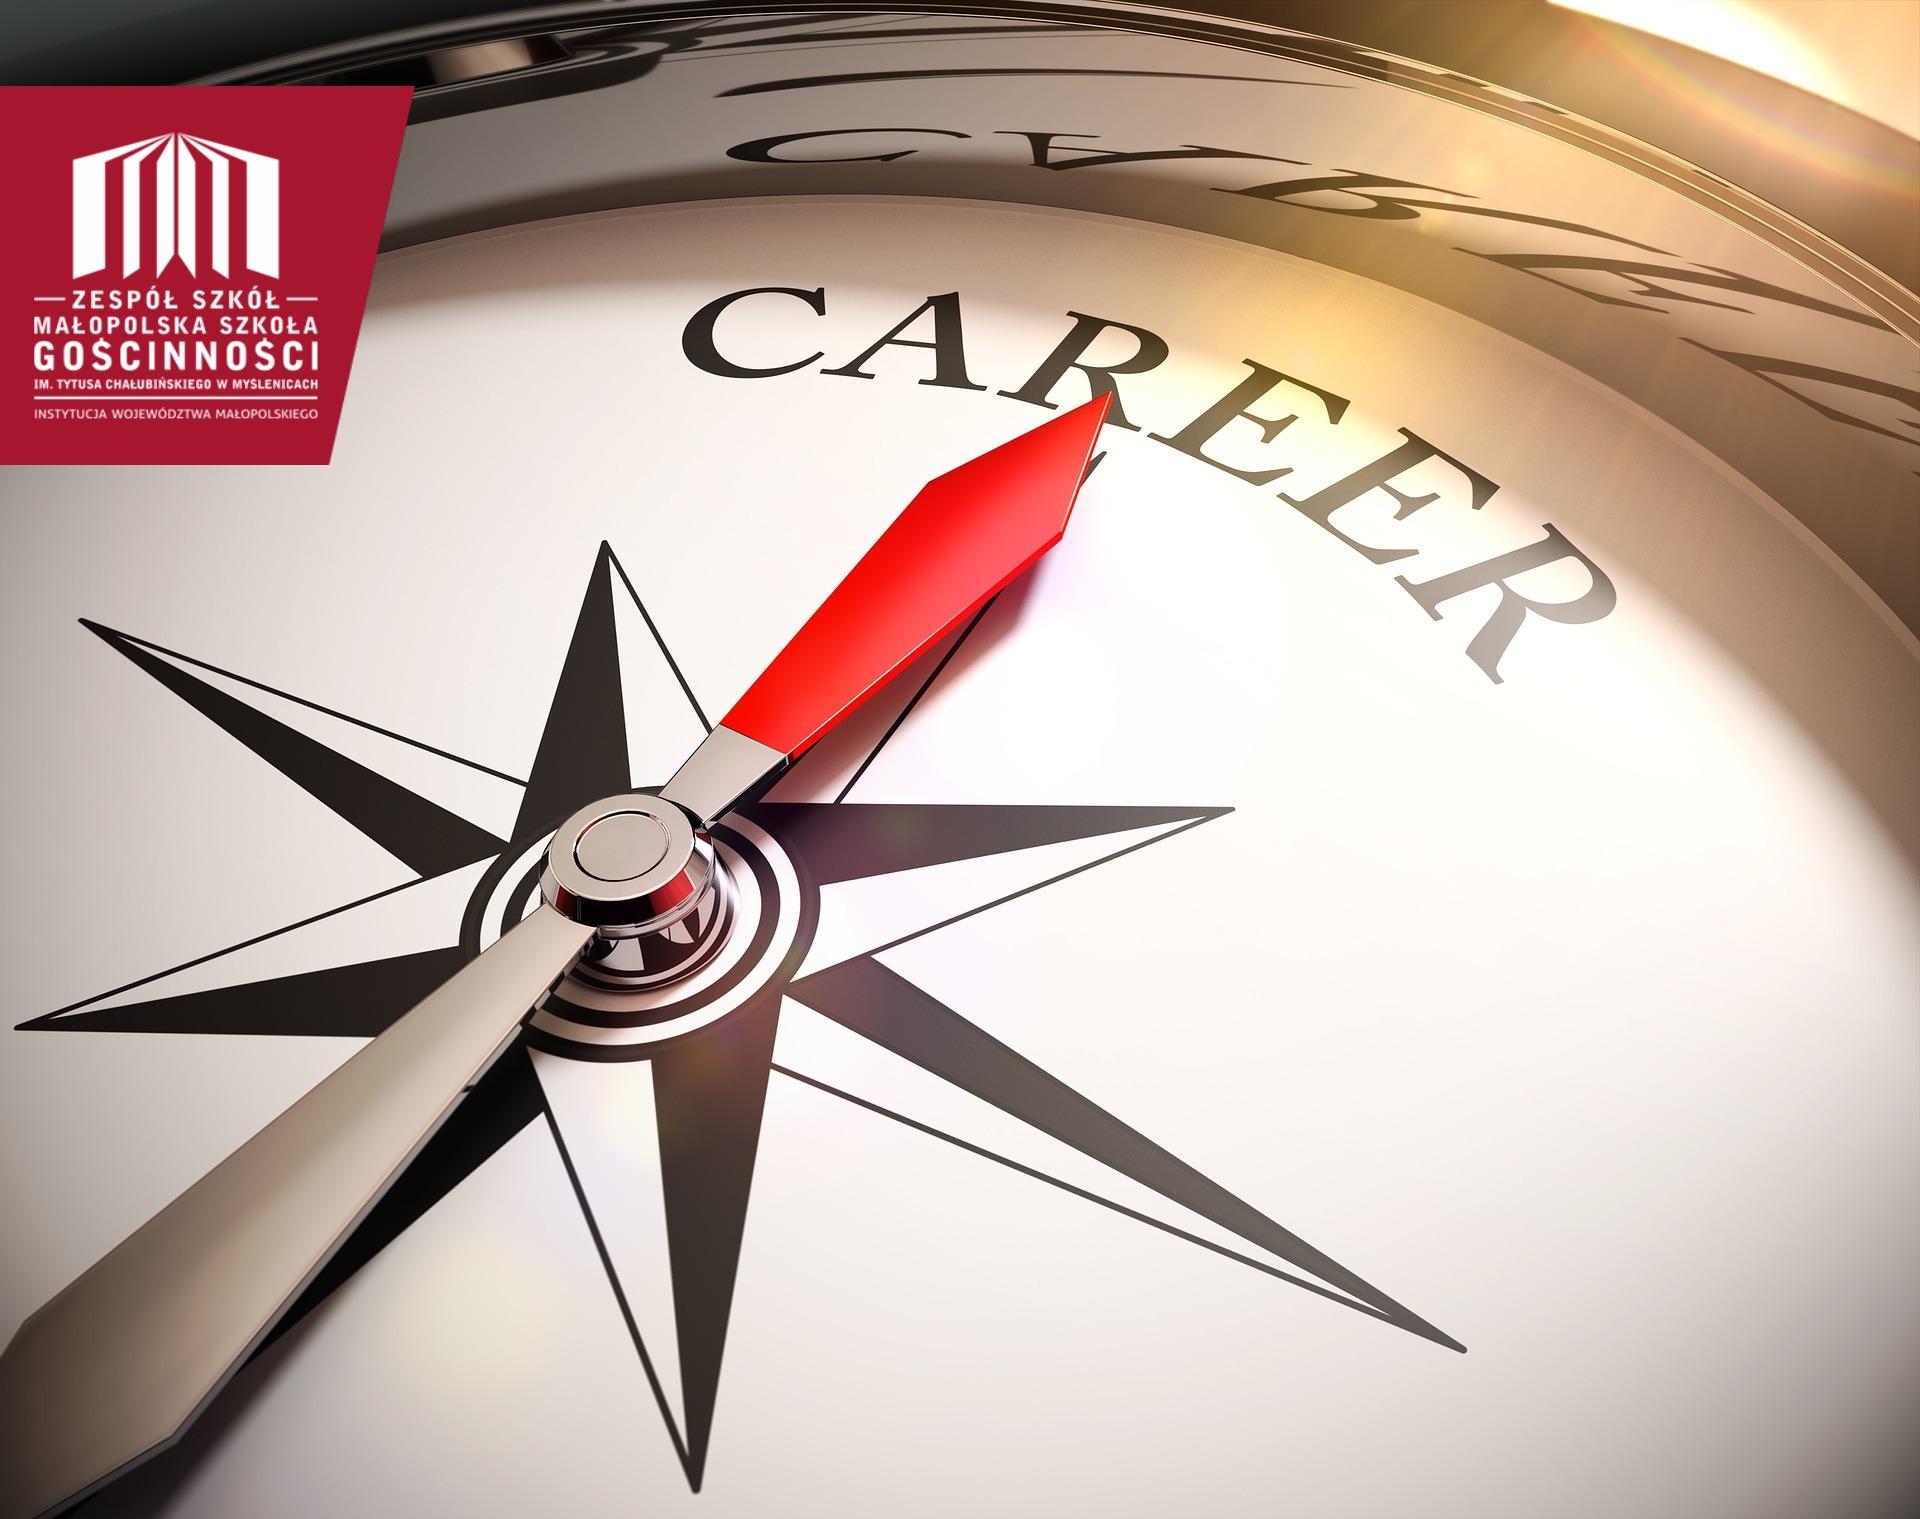 kompas z napisem career